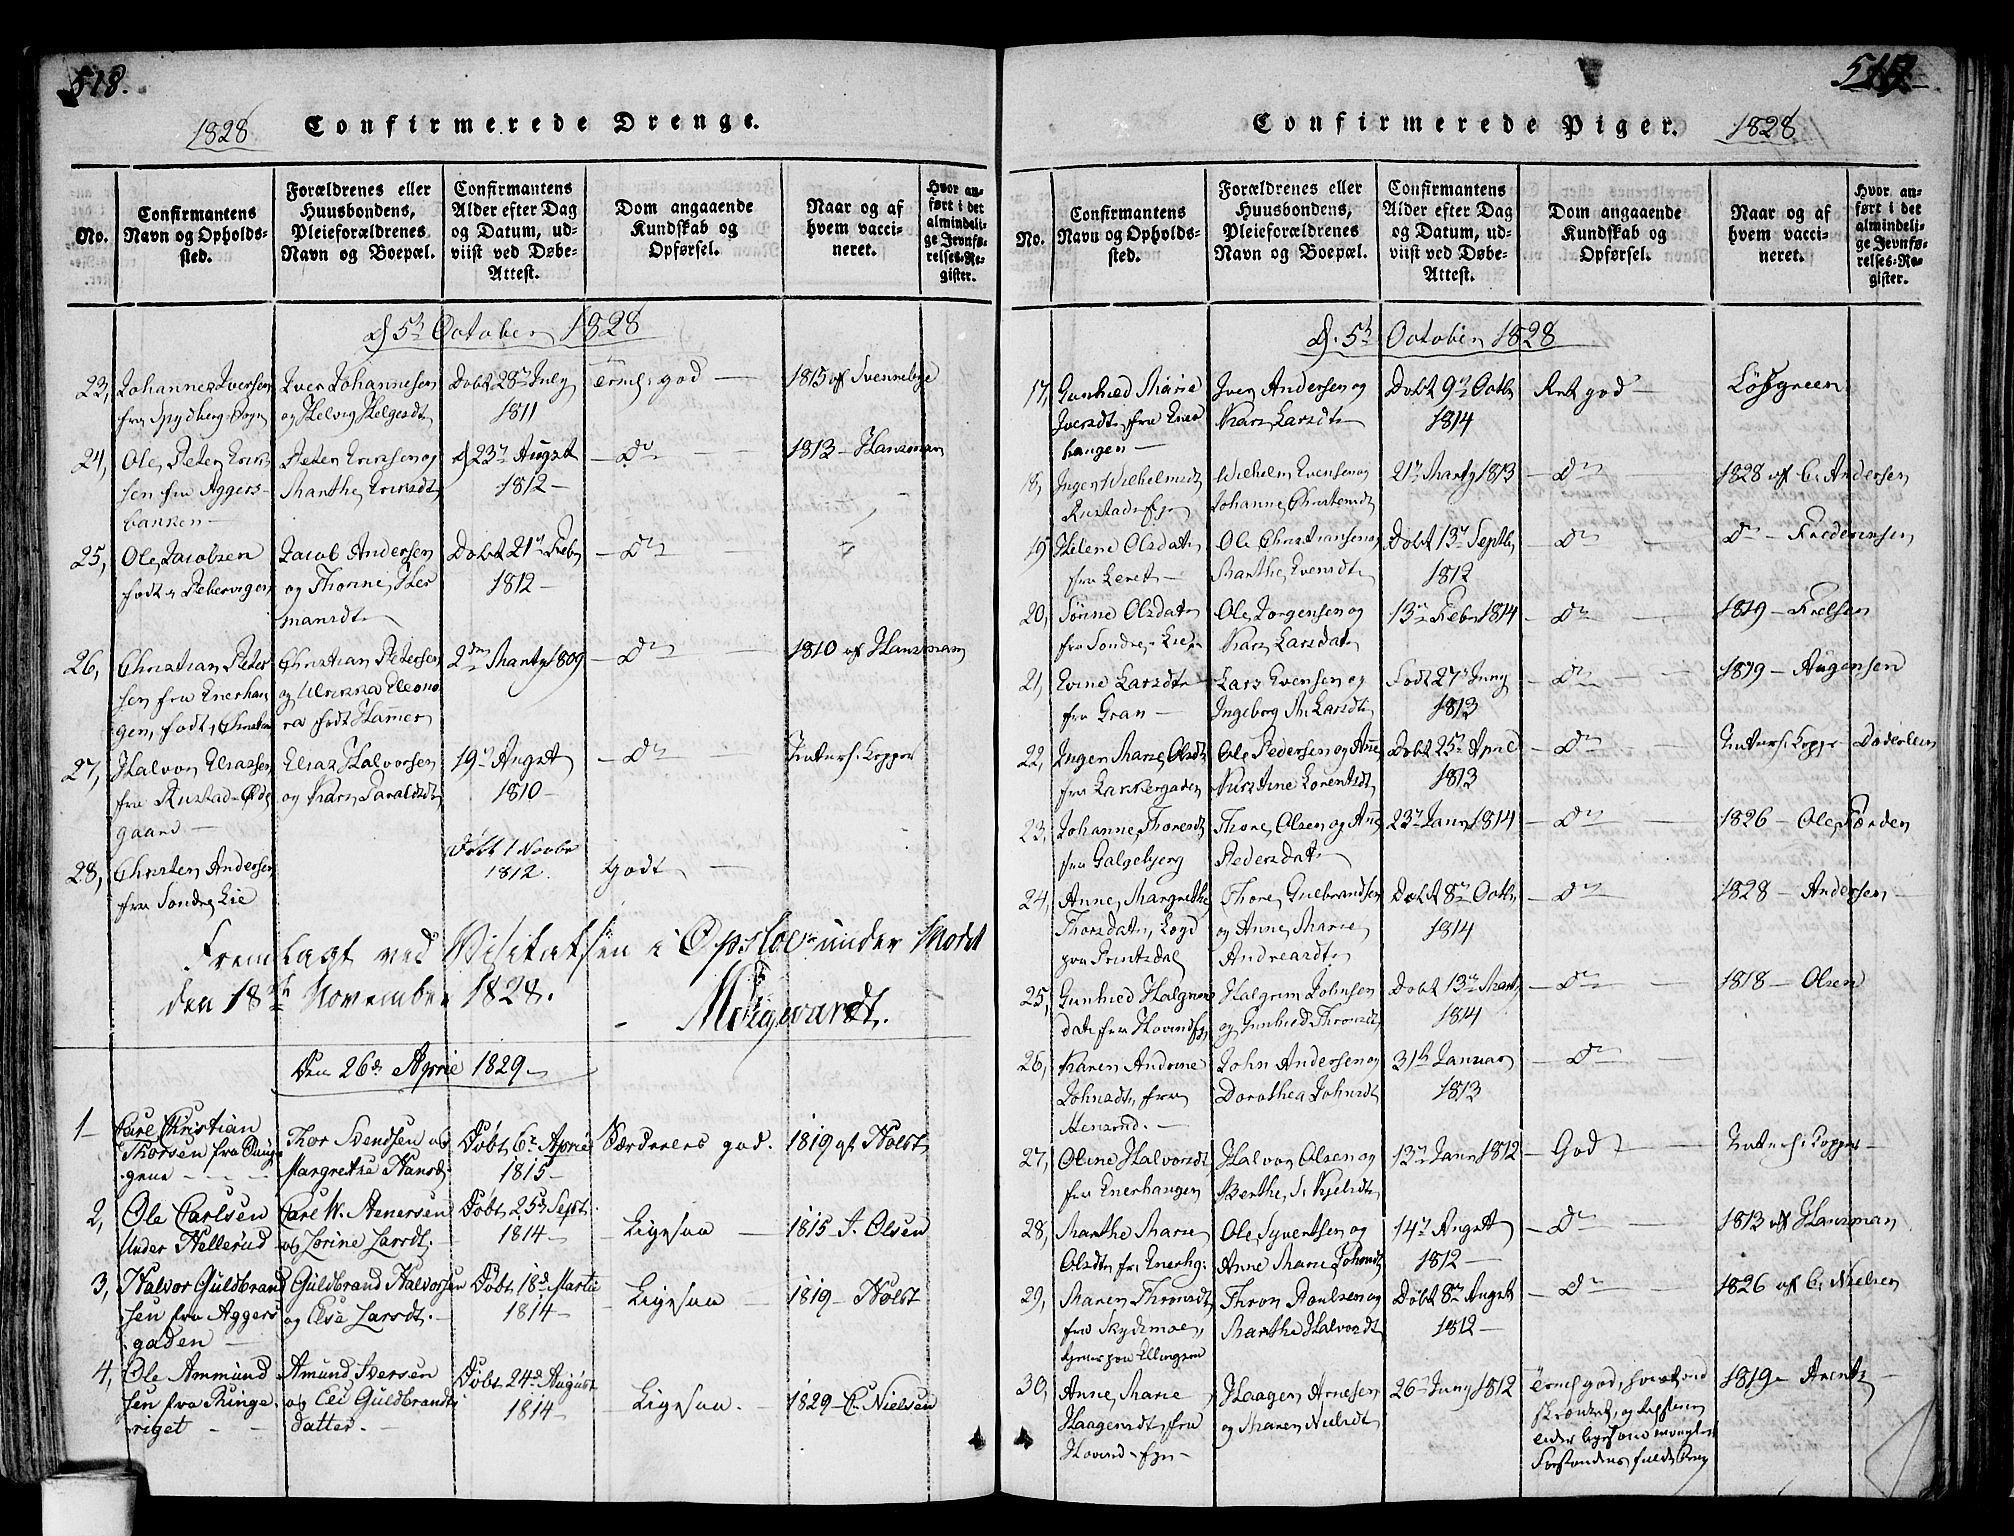 SAO, Gamlebyen prestekontor Kirkebøker, F/Fa/L0002: Parish register (official) no. 2, 1817-1829, p. 518-519